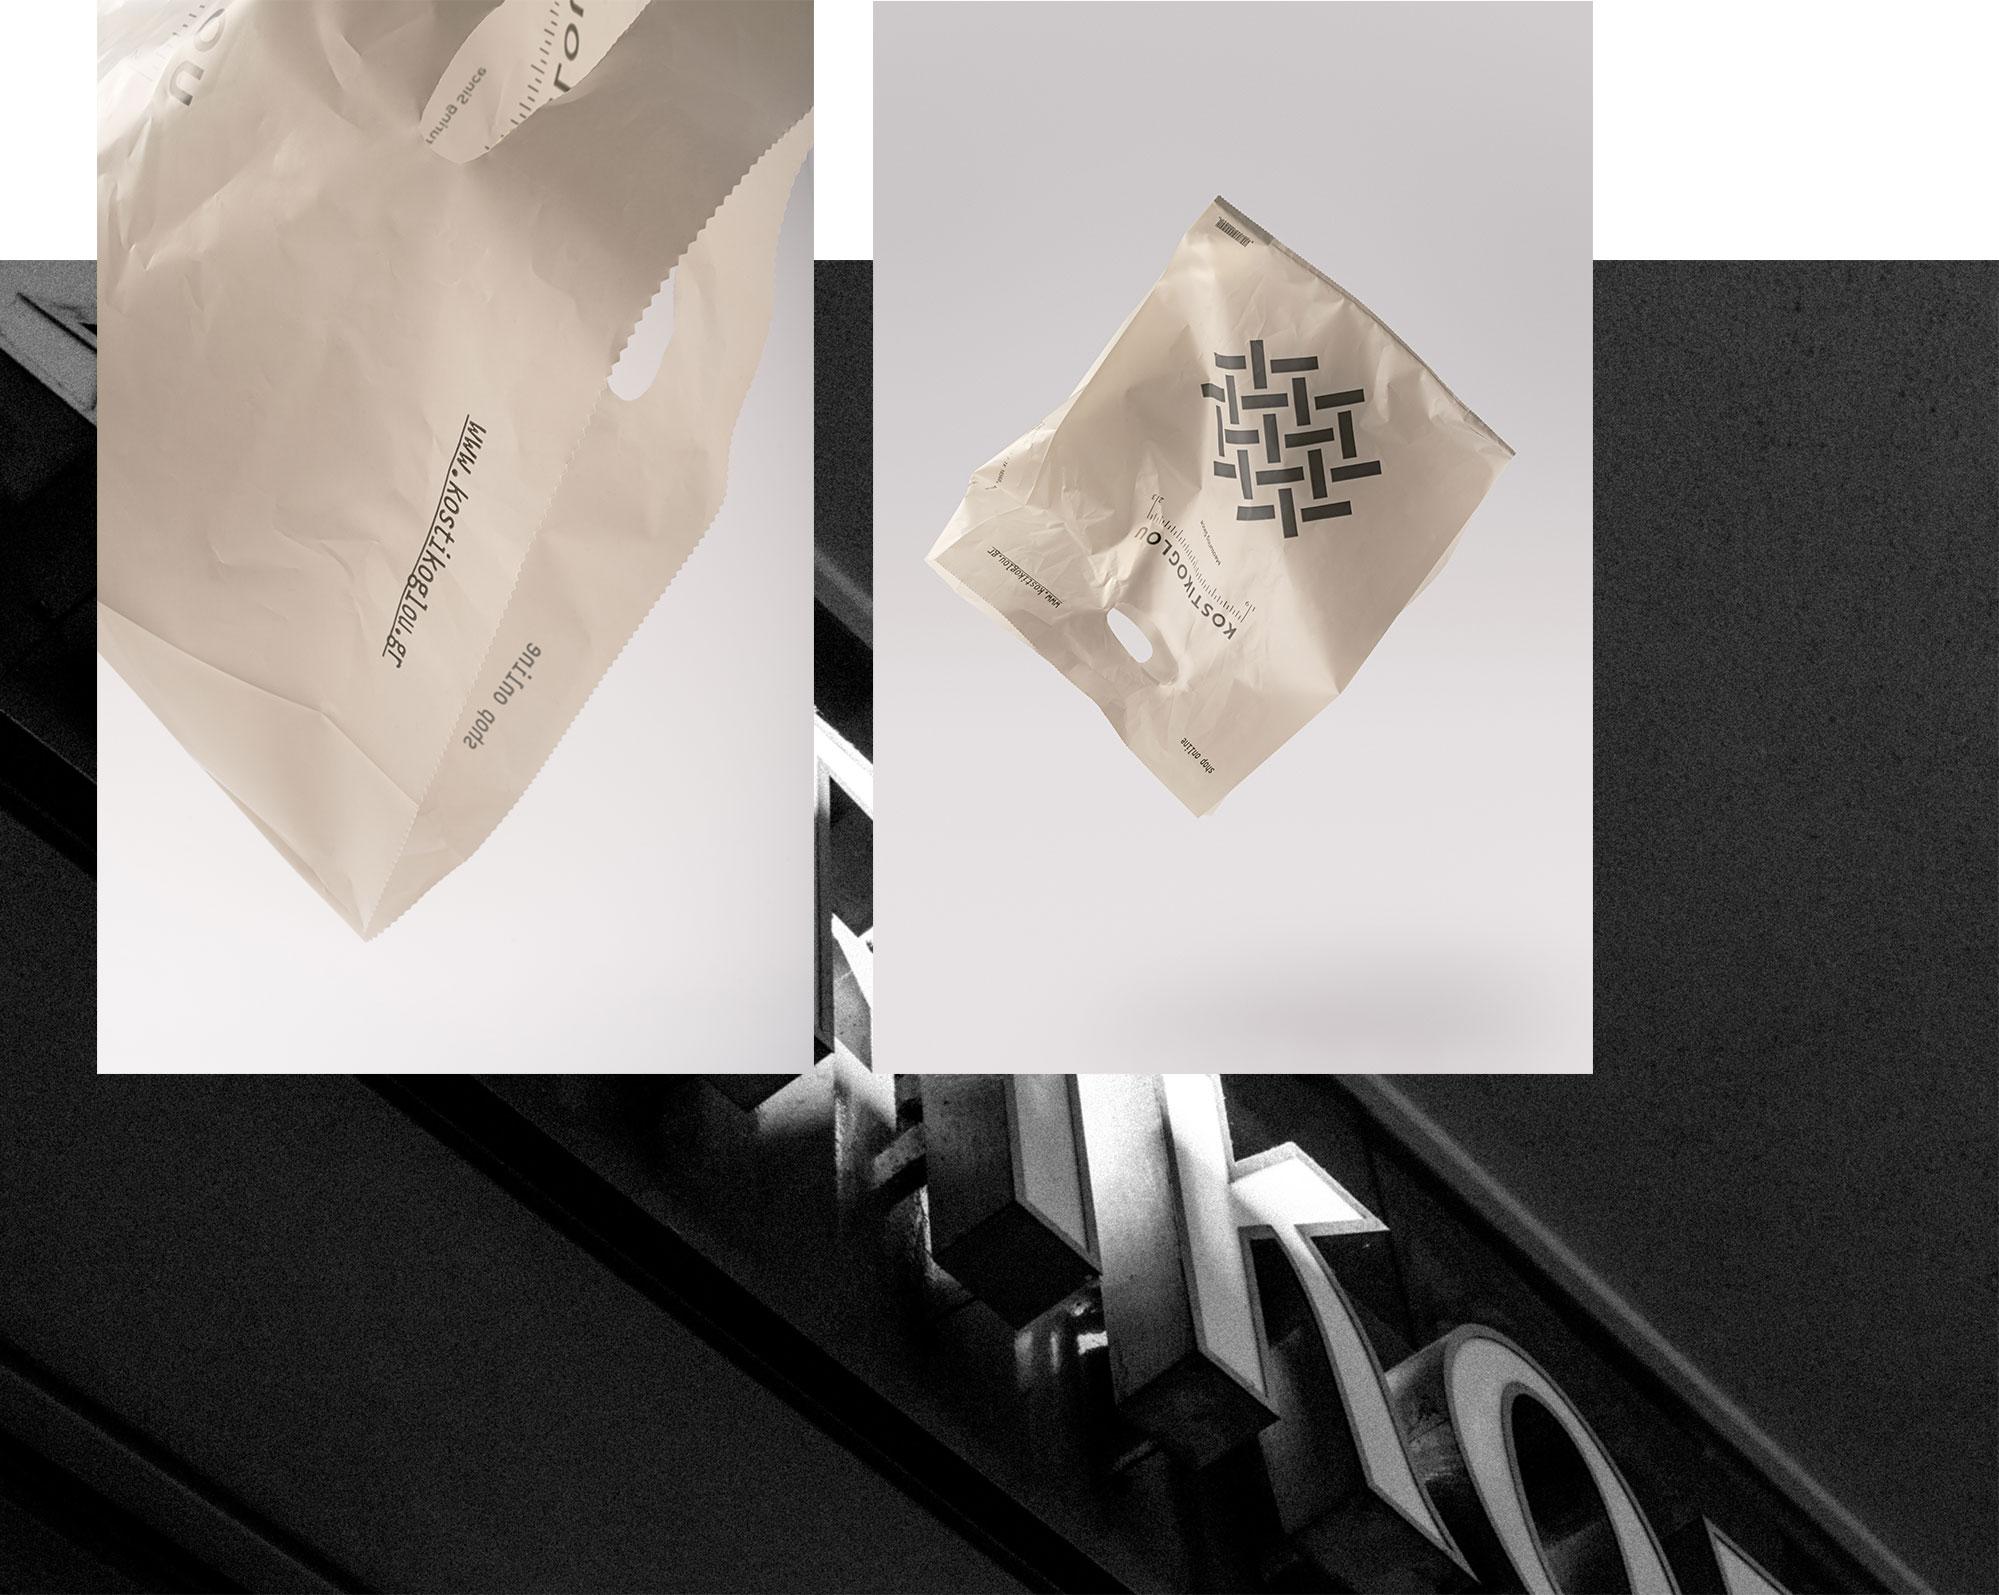 Kostikoglou Branding / World Brand Design Society